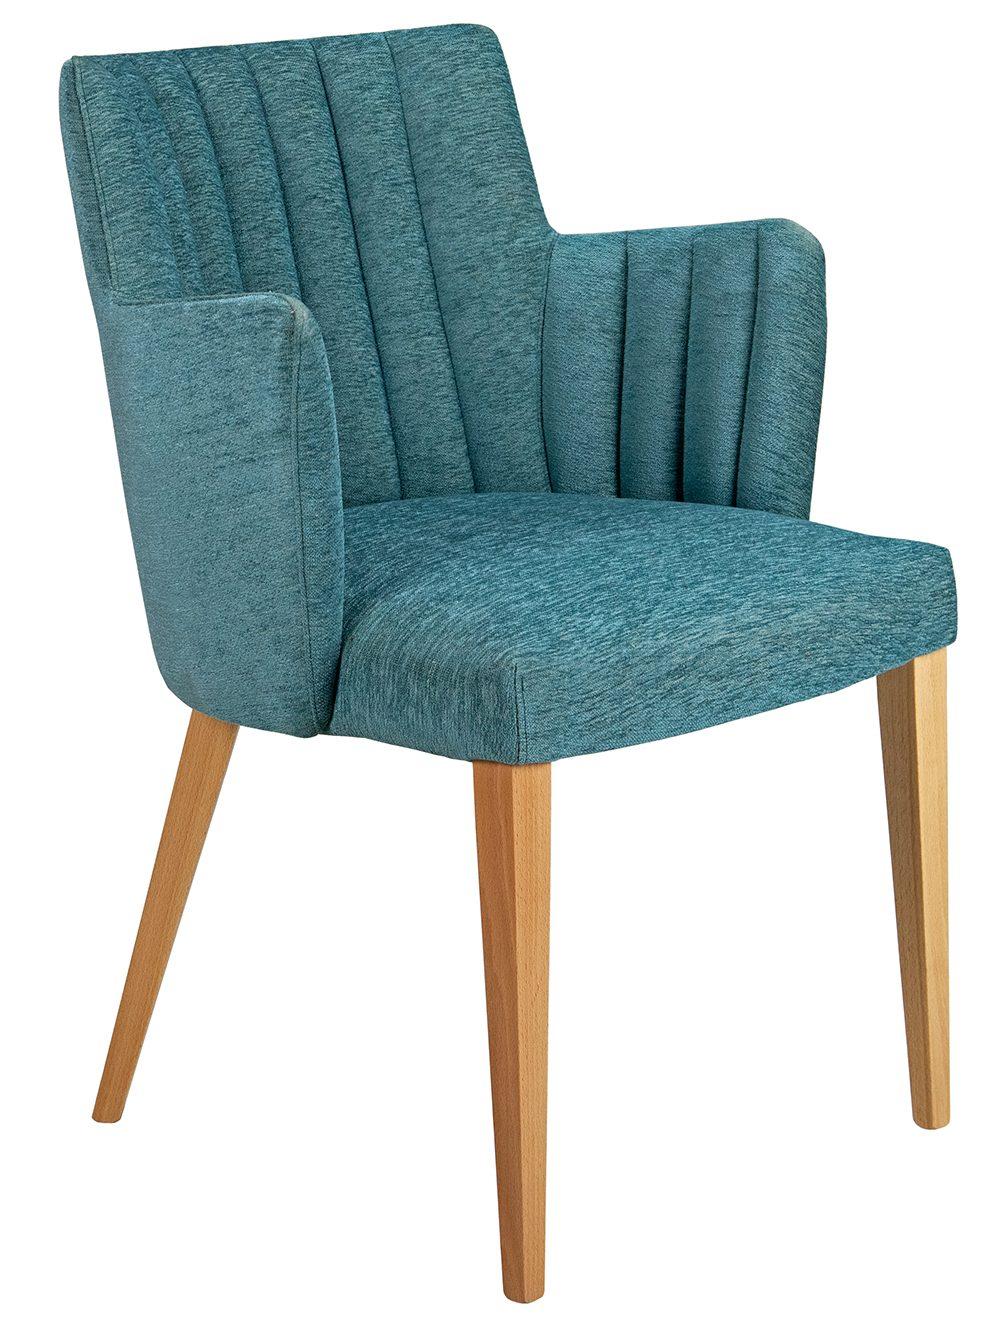 Custom Louvre Arm Chair